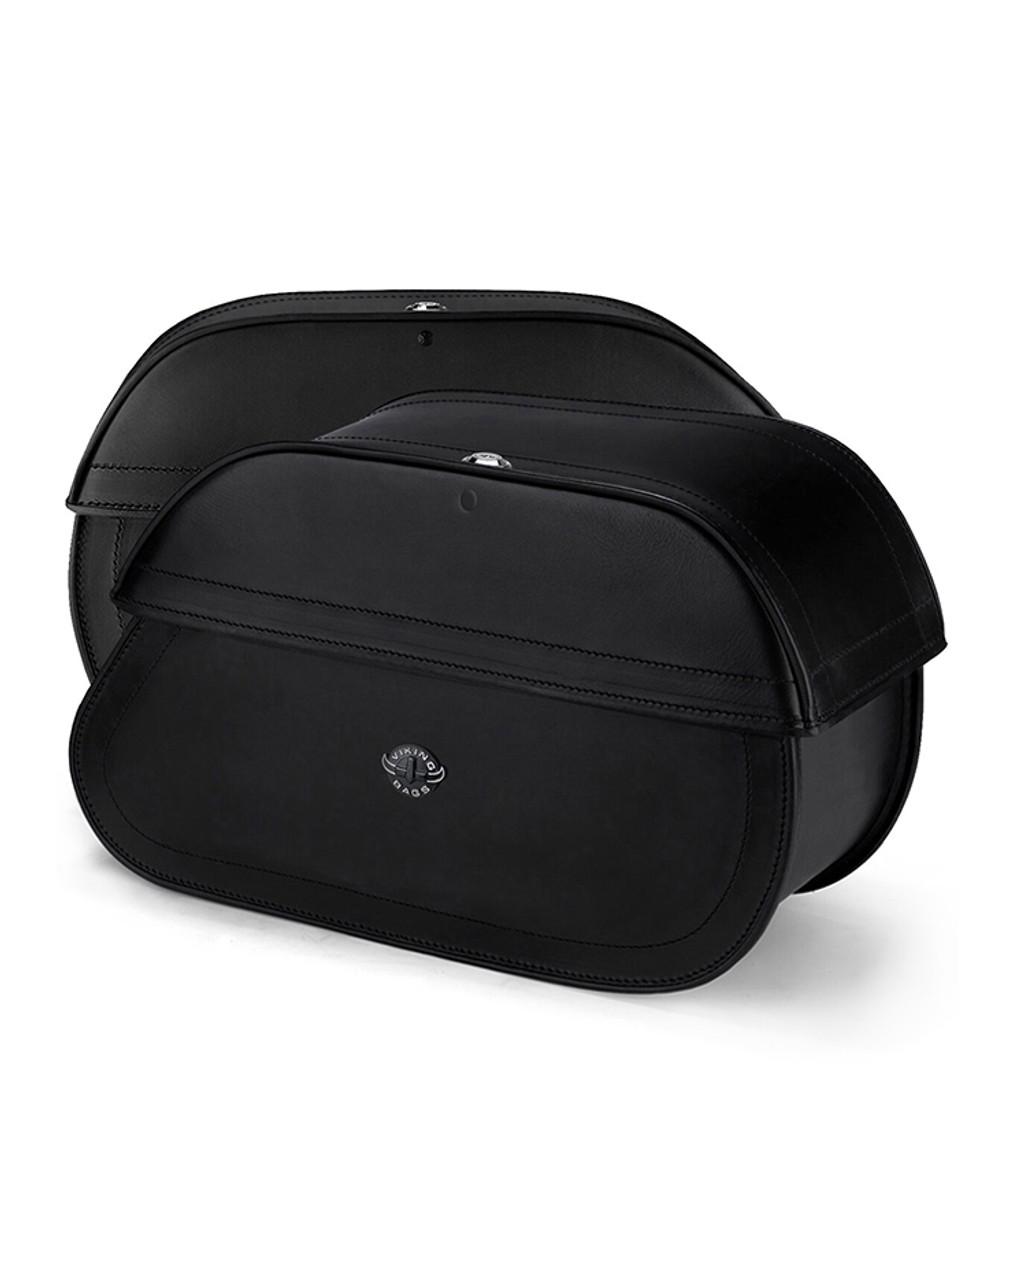 Suzuki Boulevard C90,VL1500, Intruder Hammer Series Extra Large Luggage Both Bags View